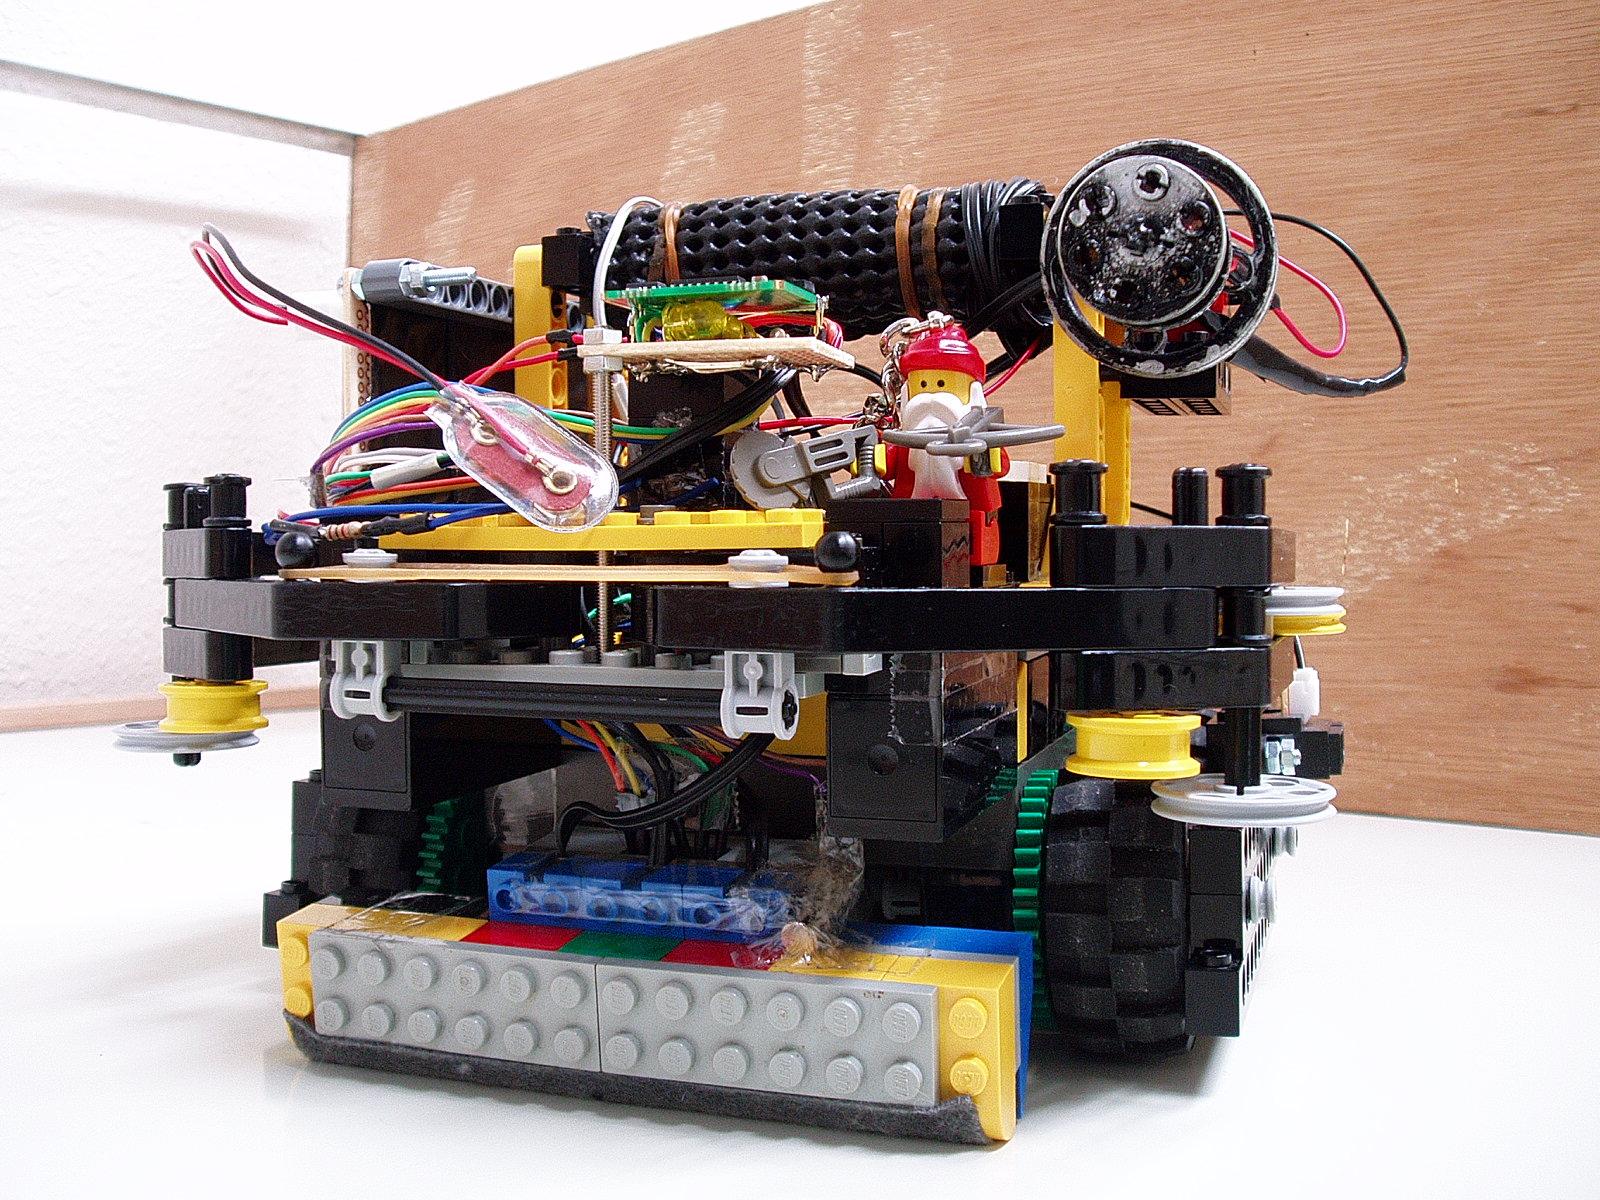 Radium機・・・今から約2年前まで使用していた機体です。この前のオープンキャンパスの際に持ってきてからずっと学校にいる私物ロボットです。